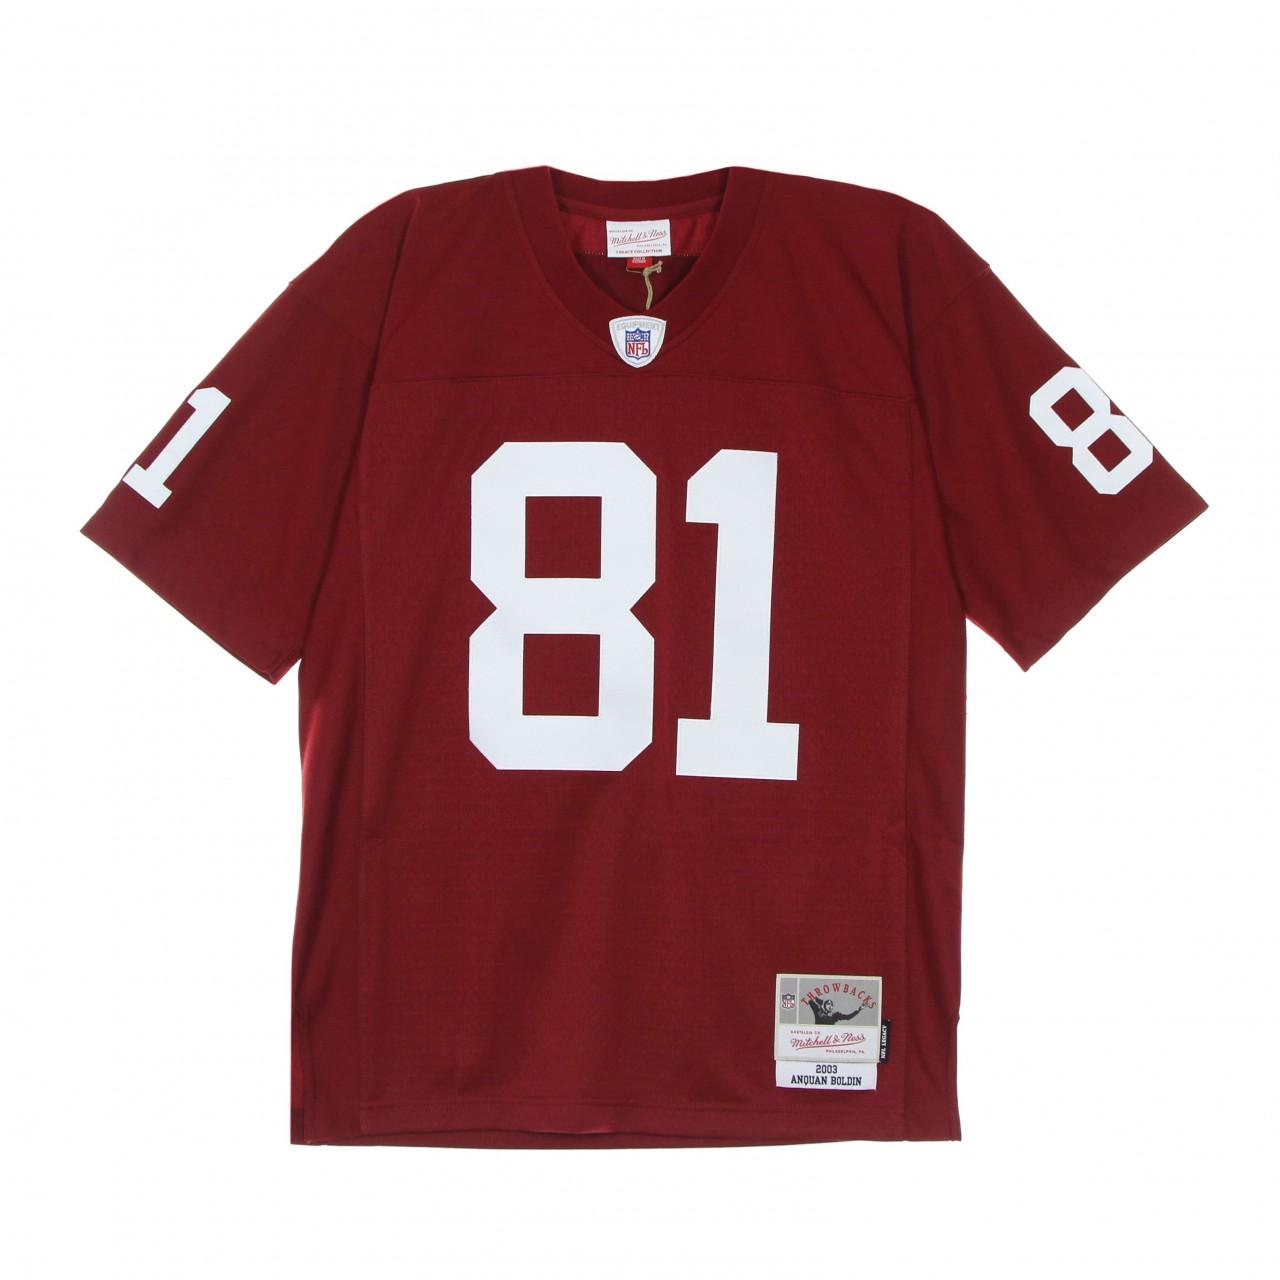 MITCHELL & NESS NFL LEGACY JERSEY ARICAR LGJY1196-ACA03ABOCARD